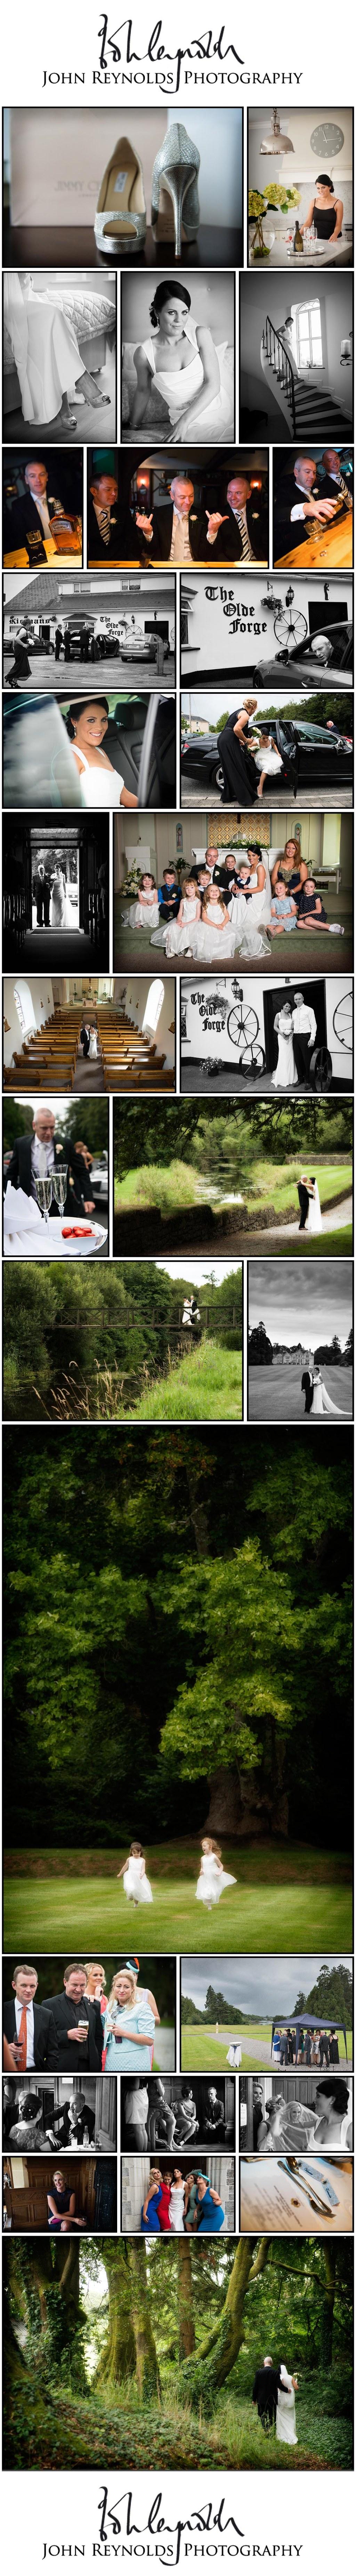 Blog Collage-Vanessa & Eamonn